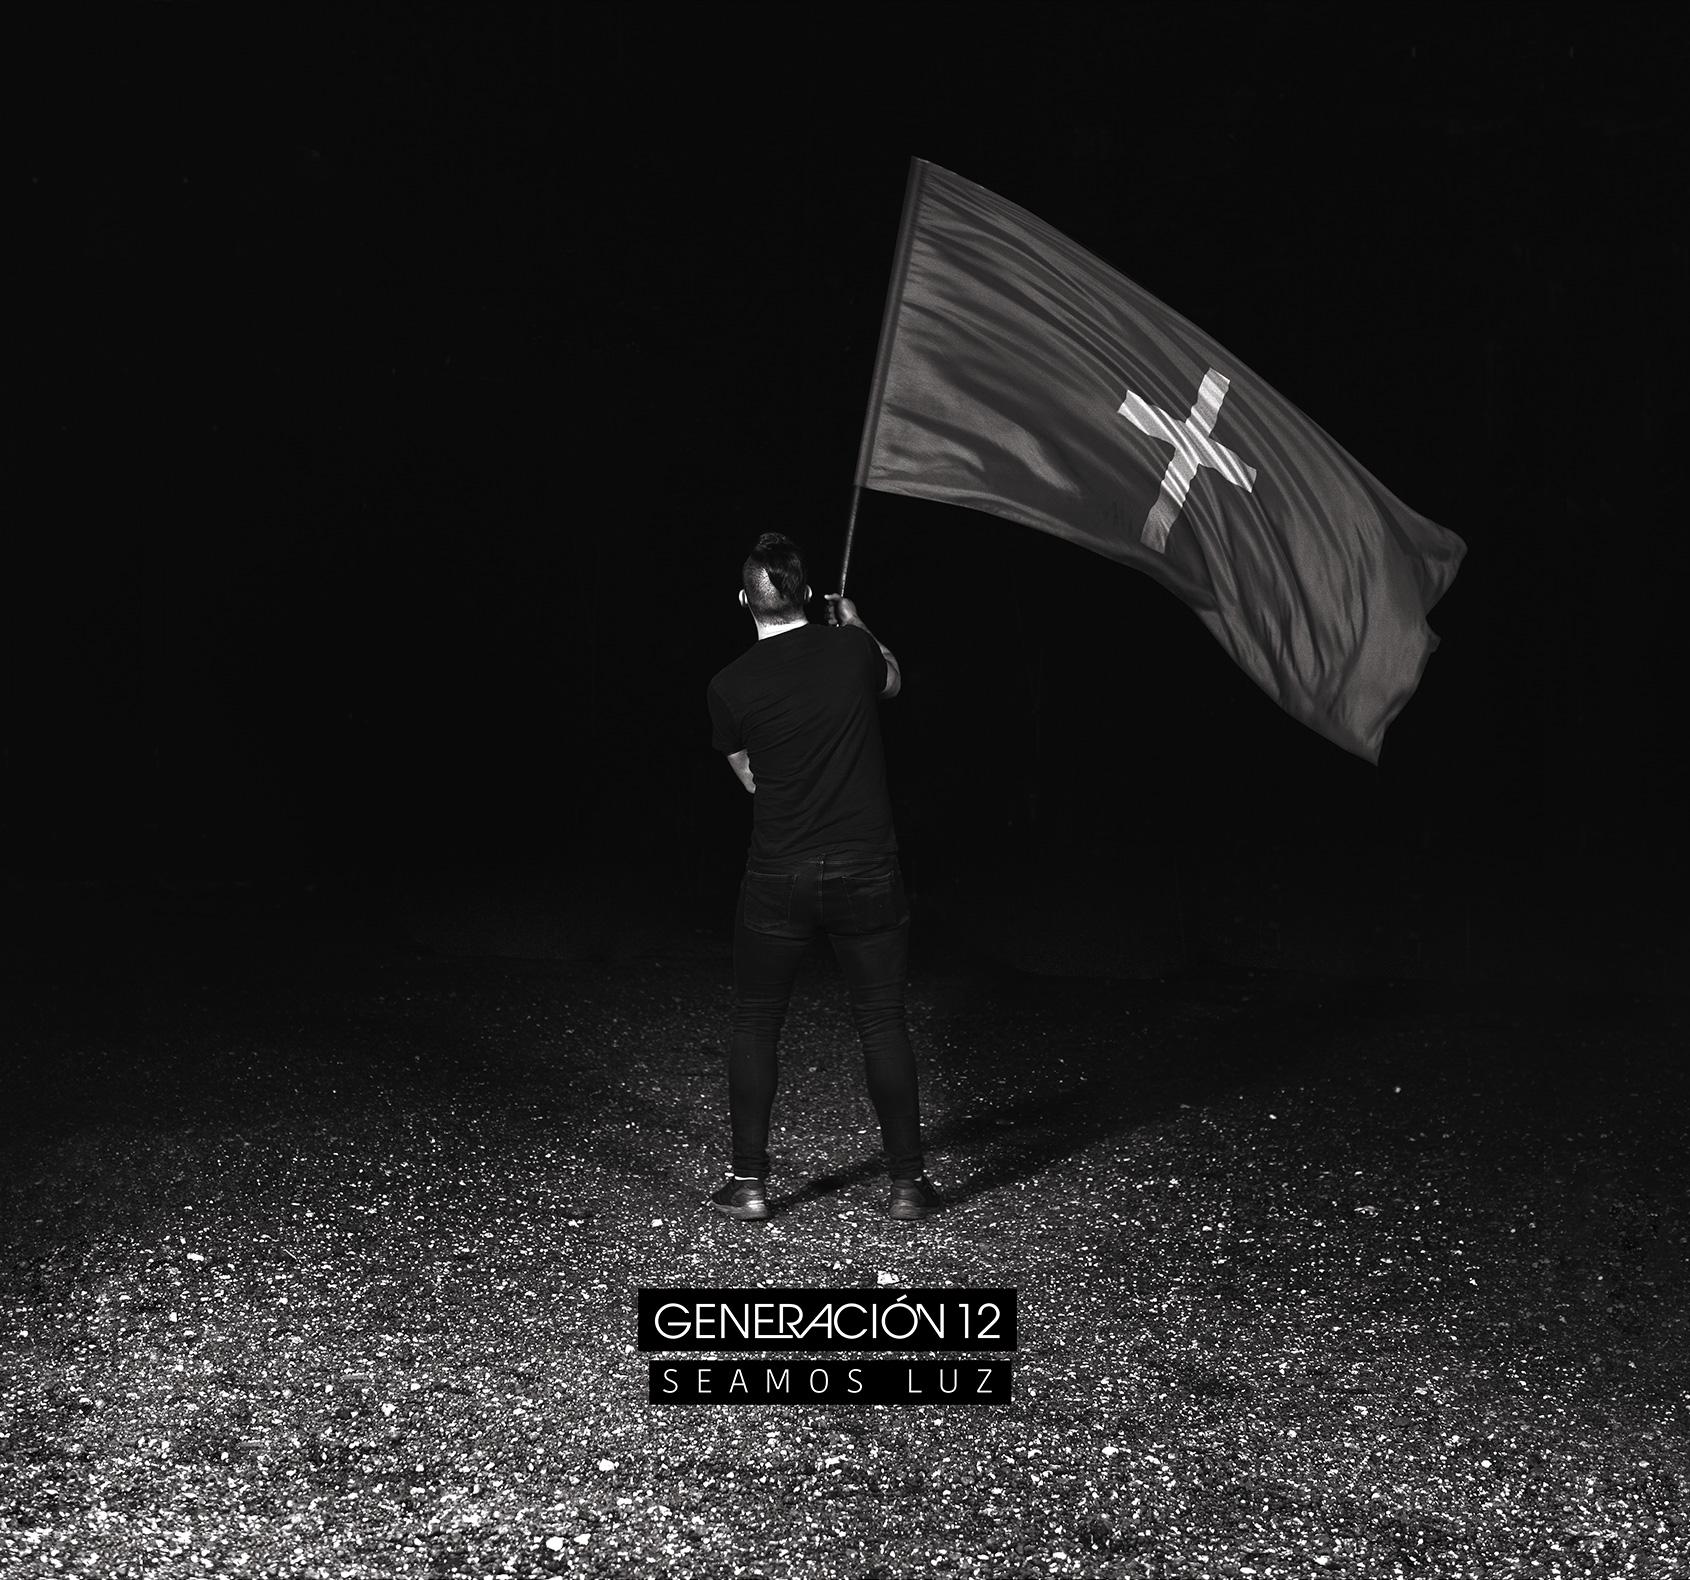 seamosluz-album